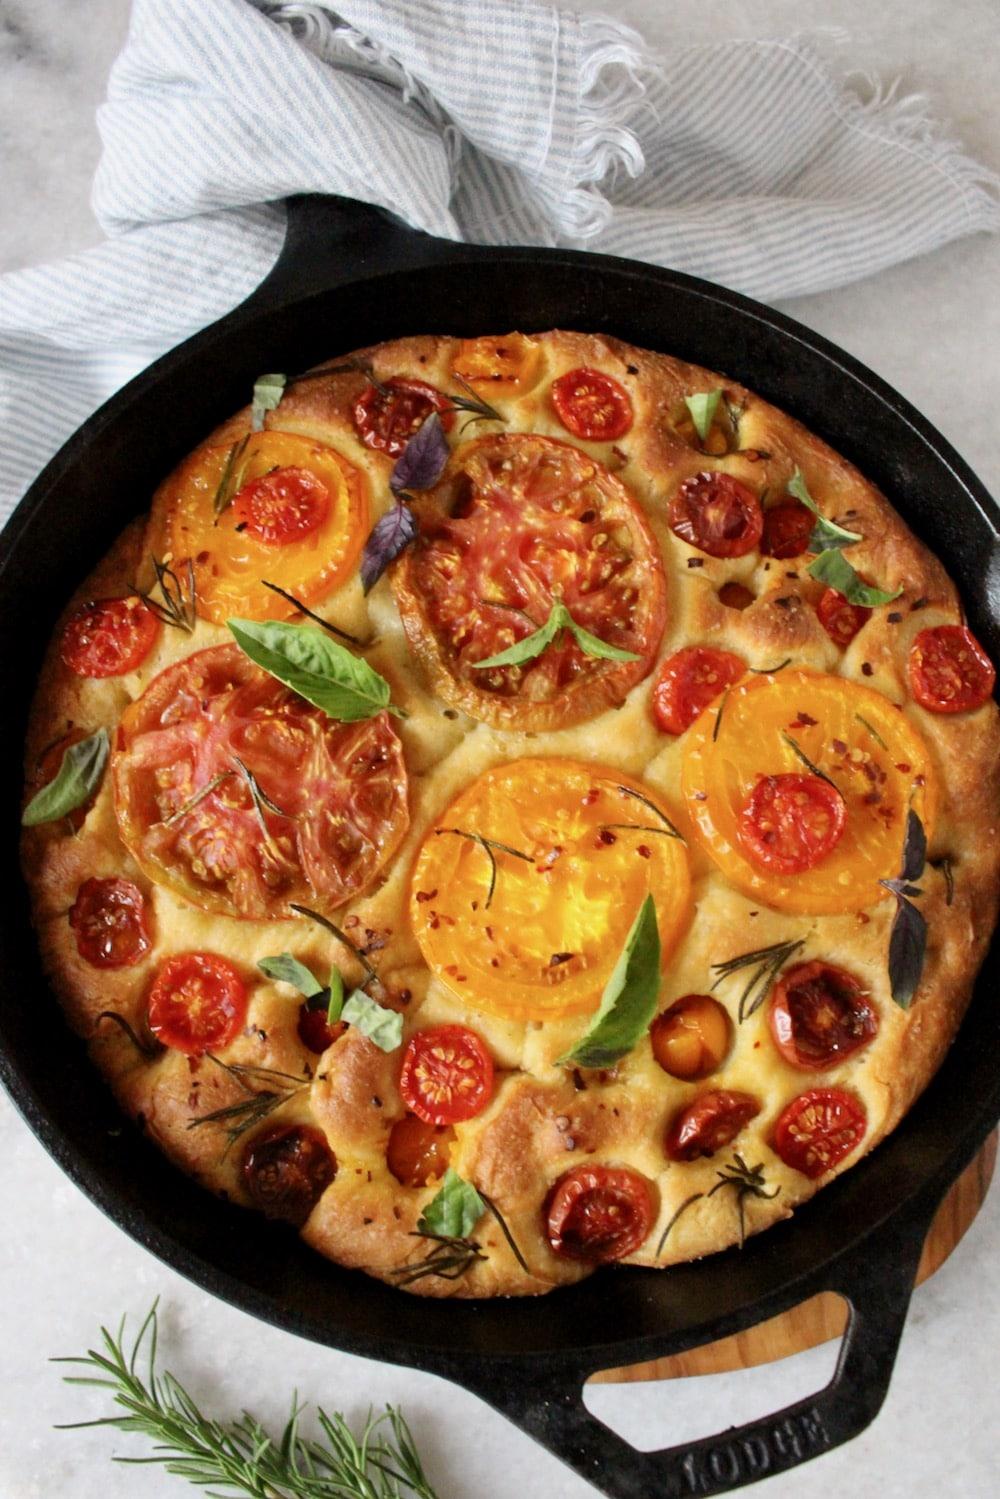 Italian Focaccia Bread Recipe with Rosemary and Tomatoes